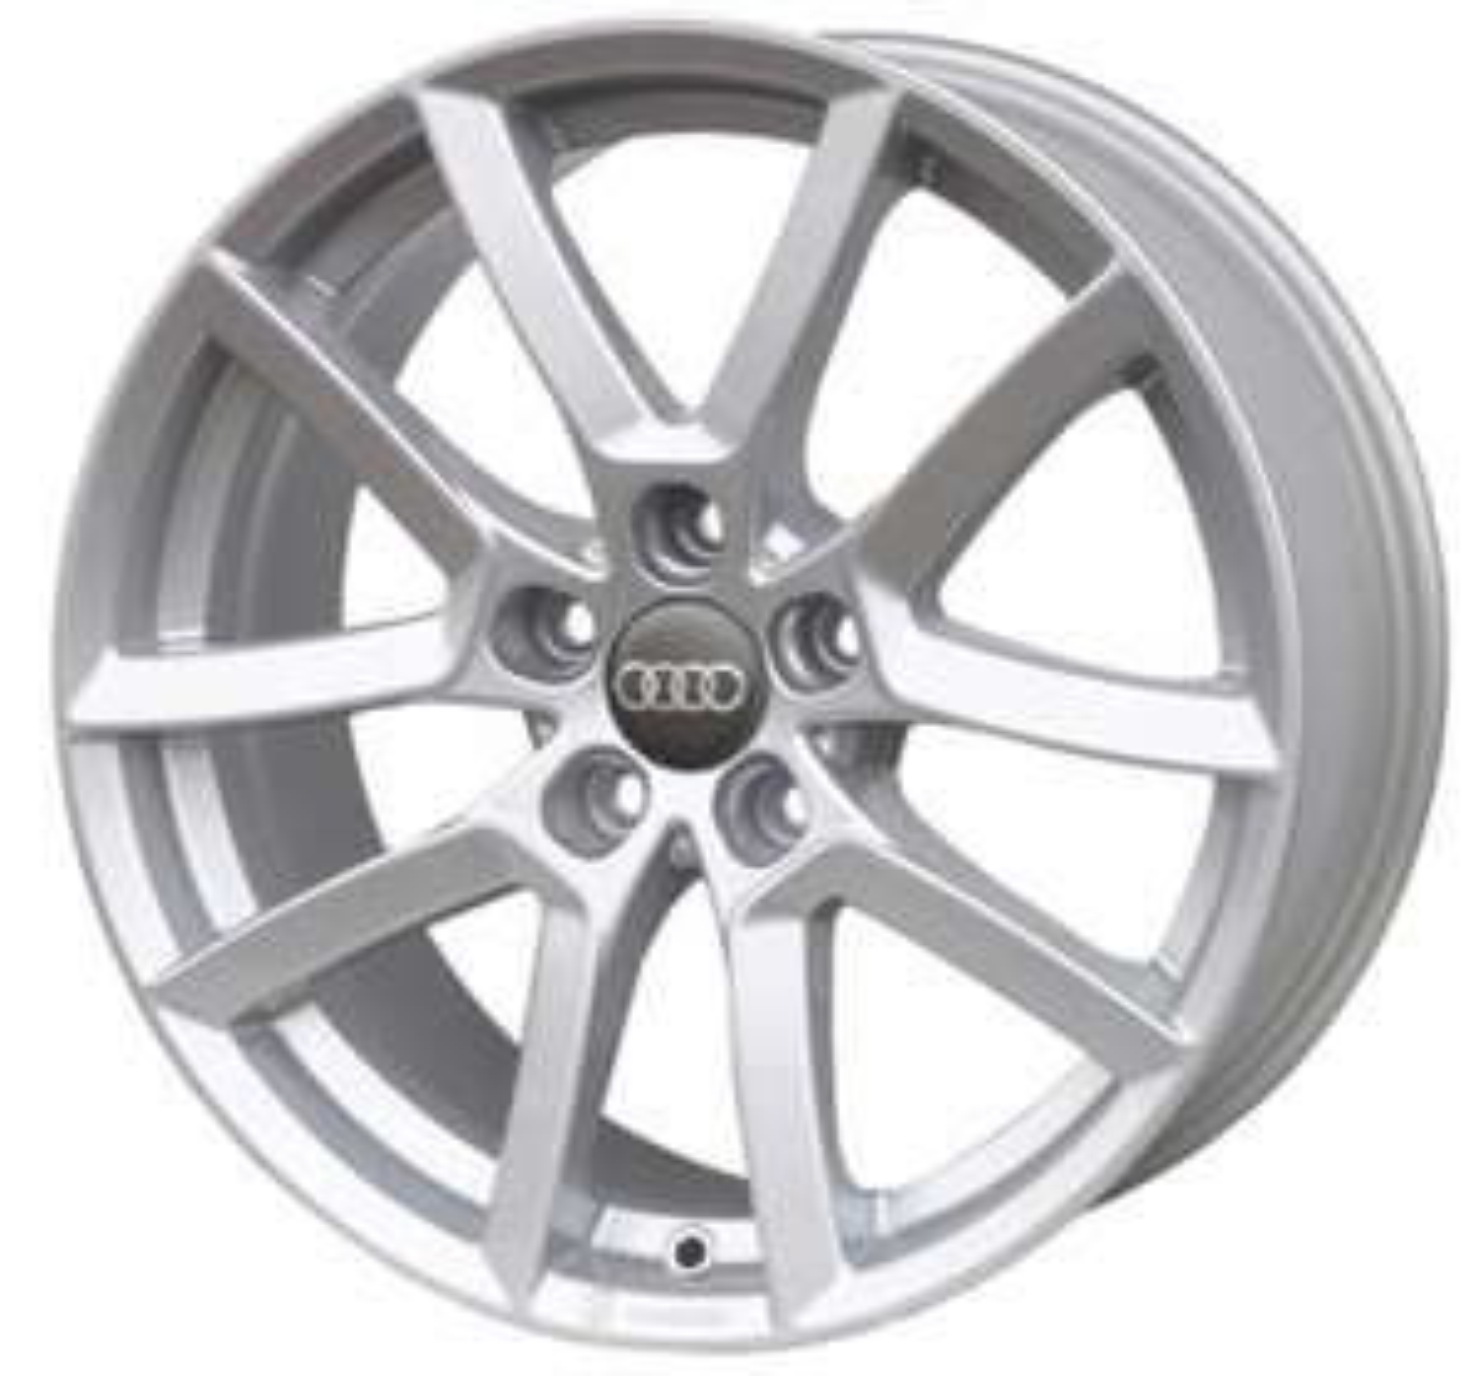 Felgi Aluminiowe 17 5x112 AUDI A4 A5 A6 Q5 VW TIGUAN PASSAT